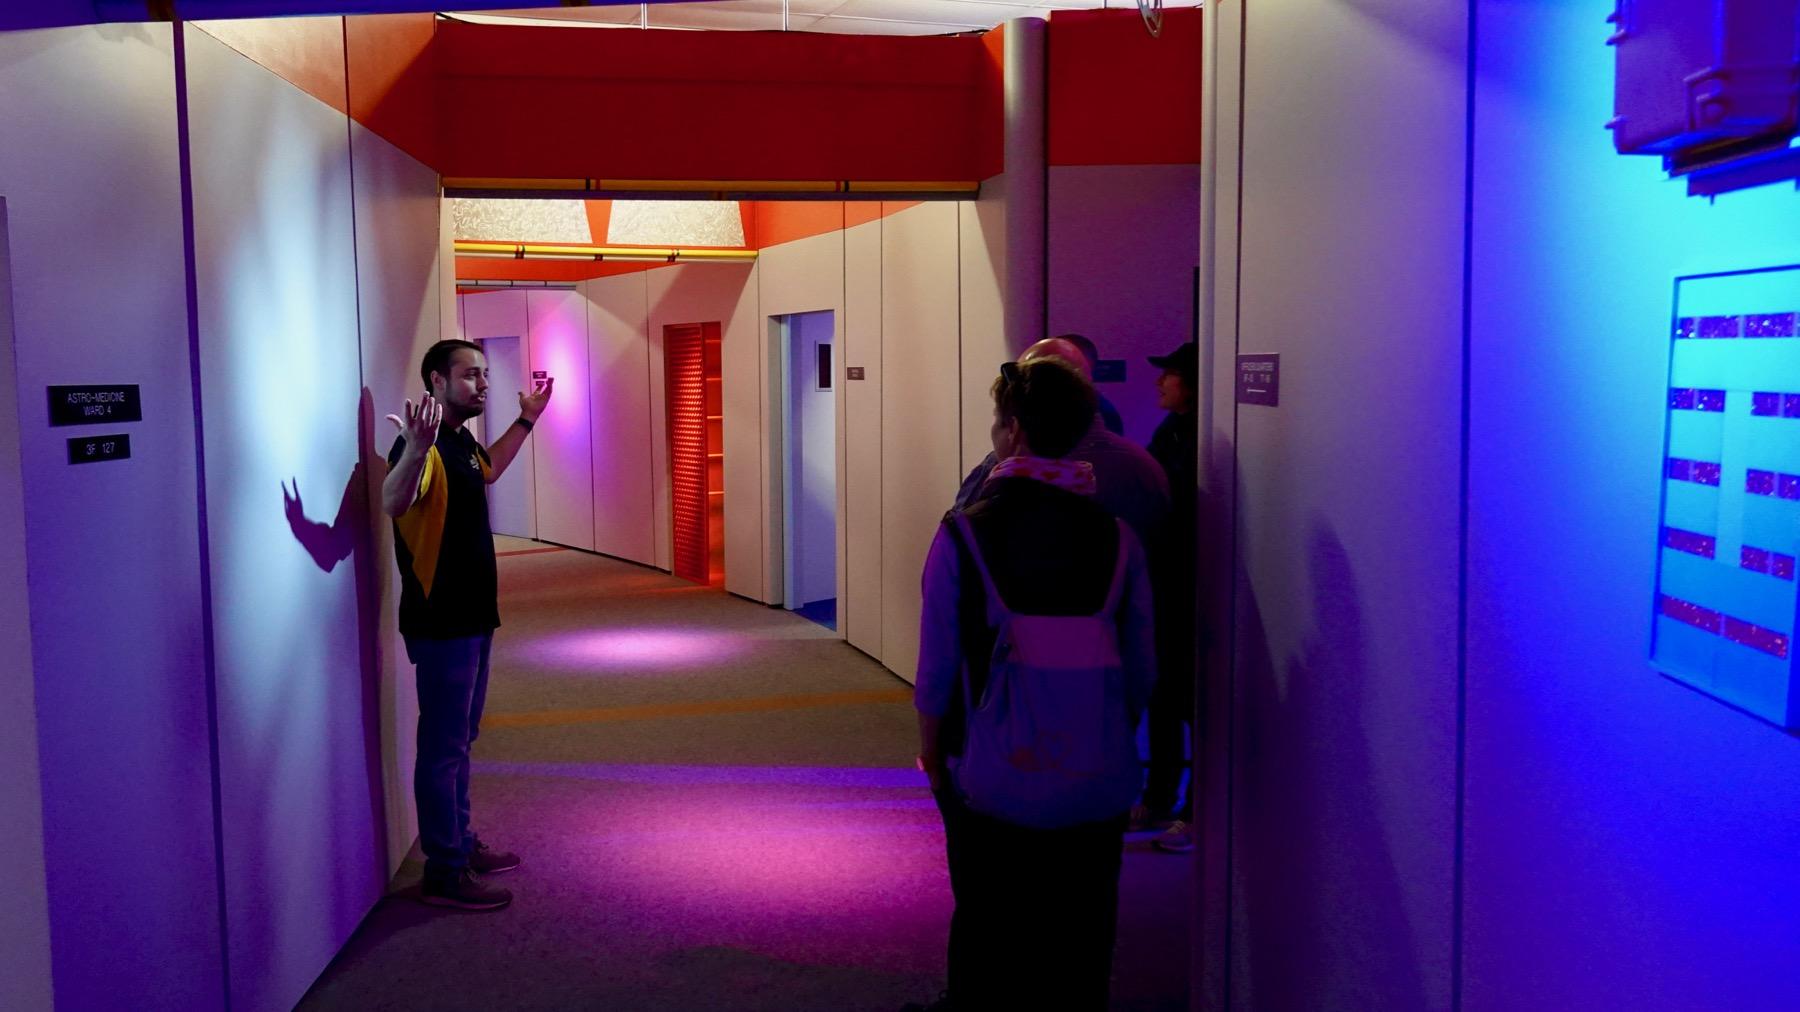 Magic hallway